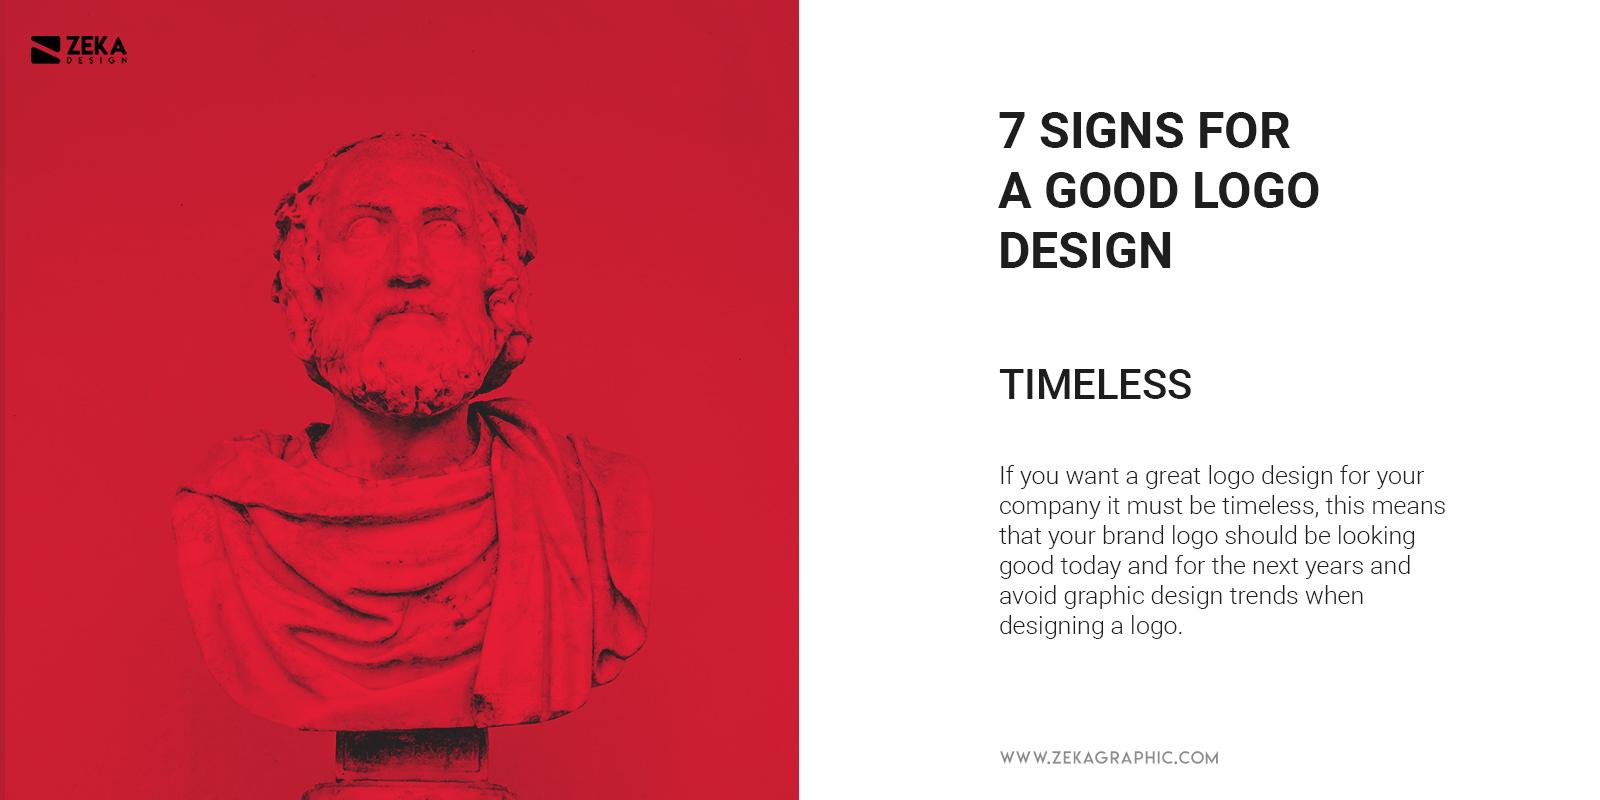 Timeless Logo Design Quality What Makes Good Logo Design